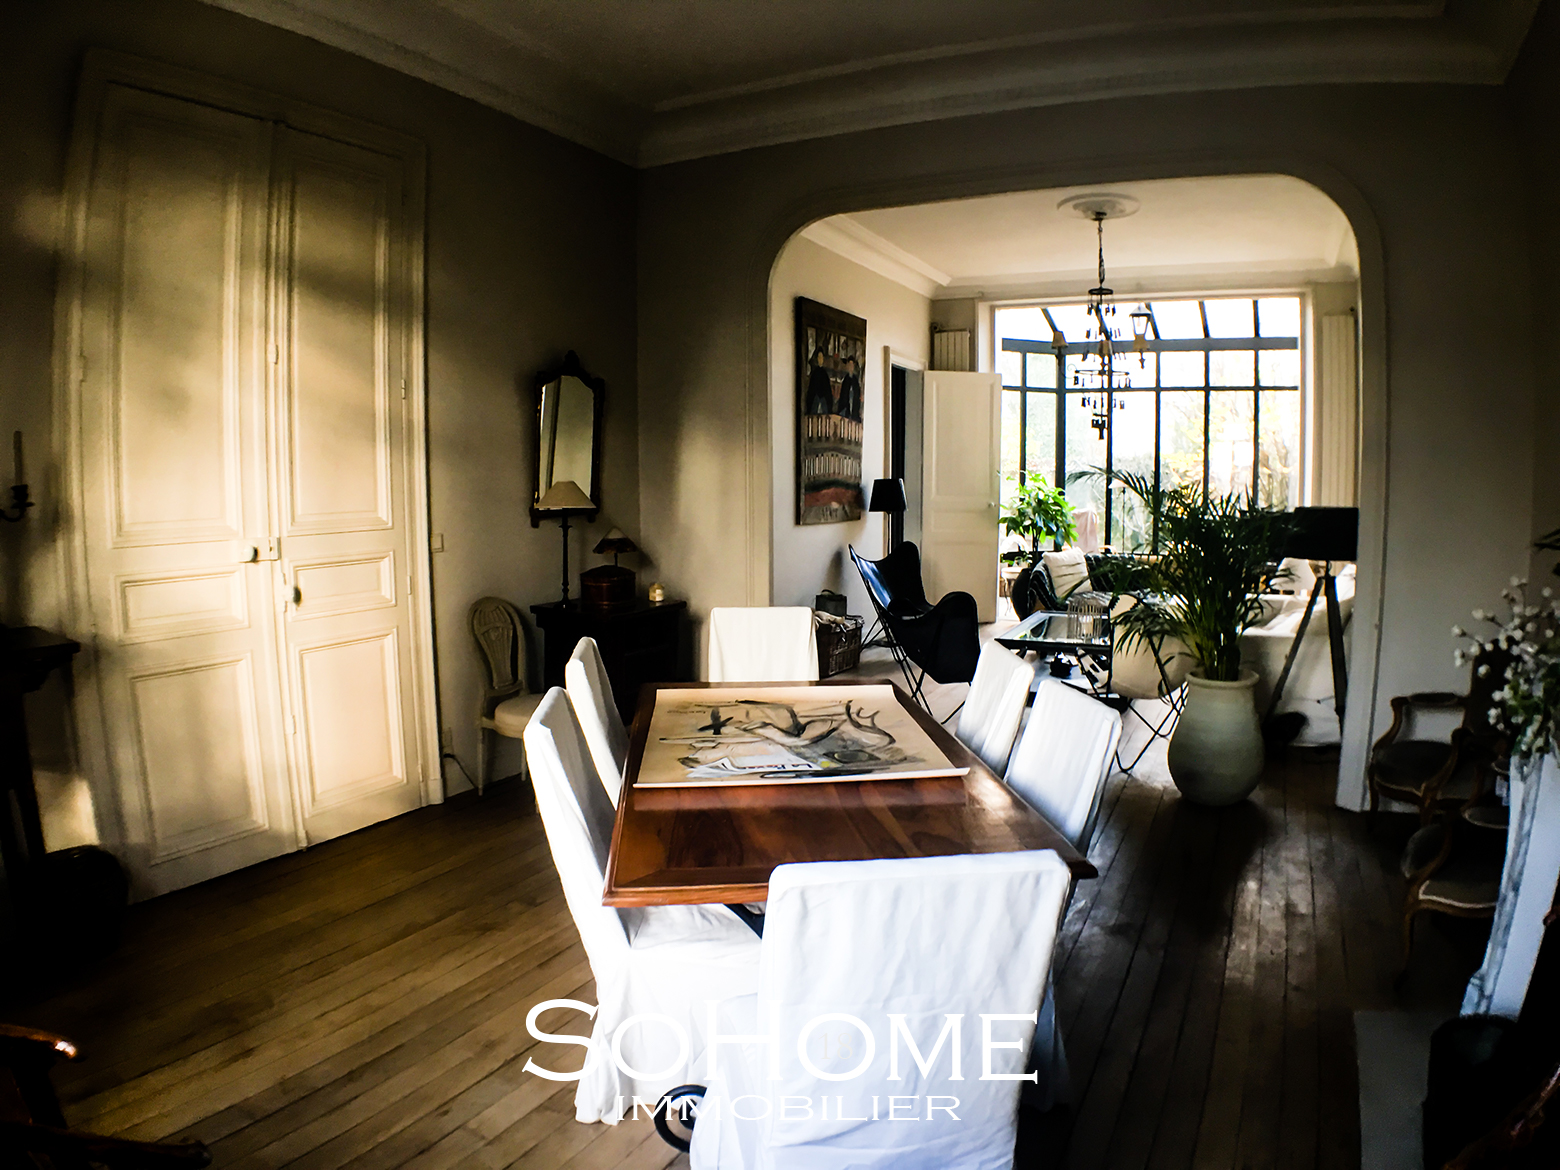 SoHome-COSI-maison-reims-10.jpg